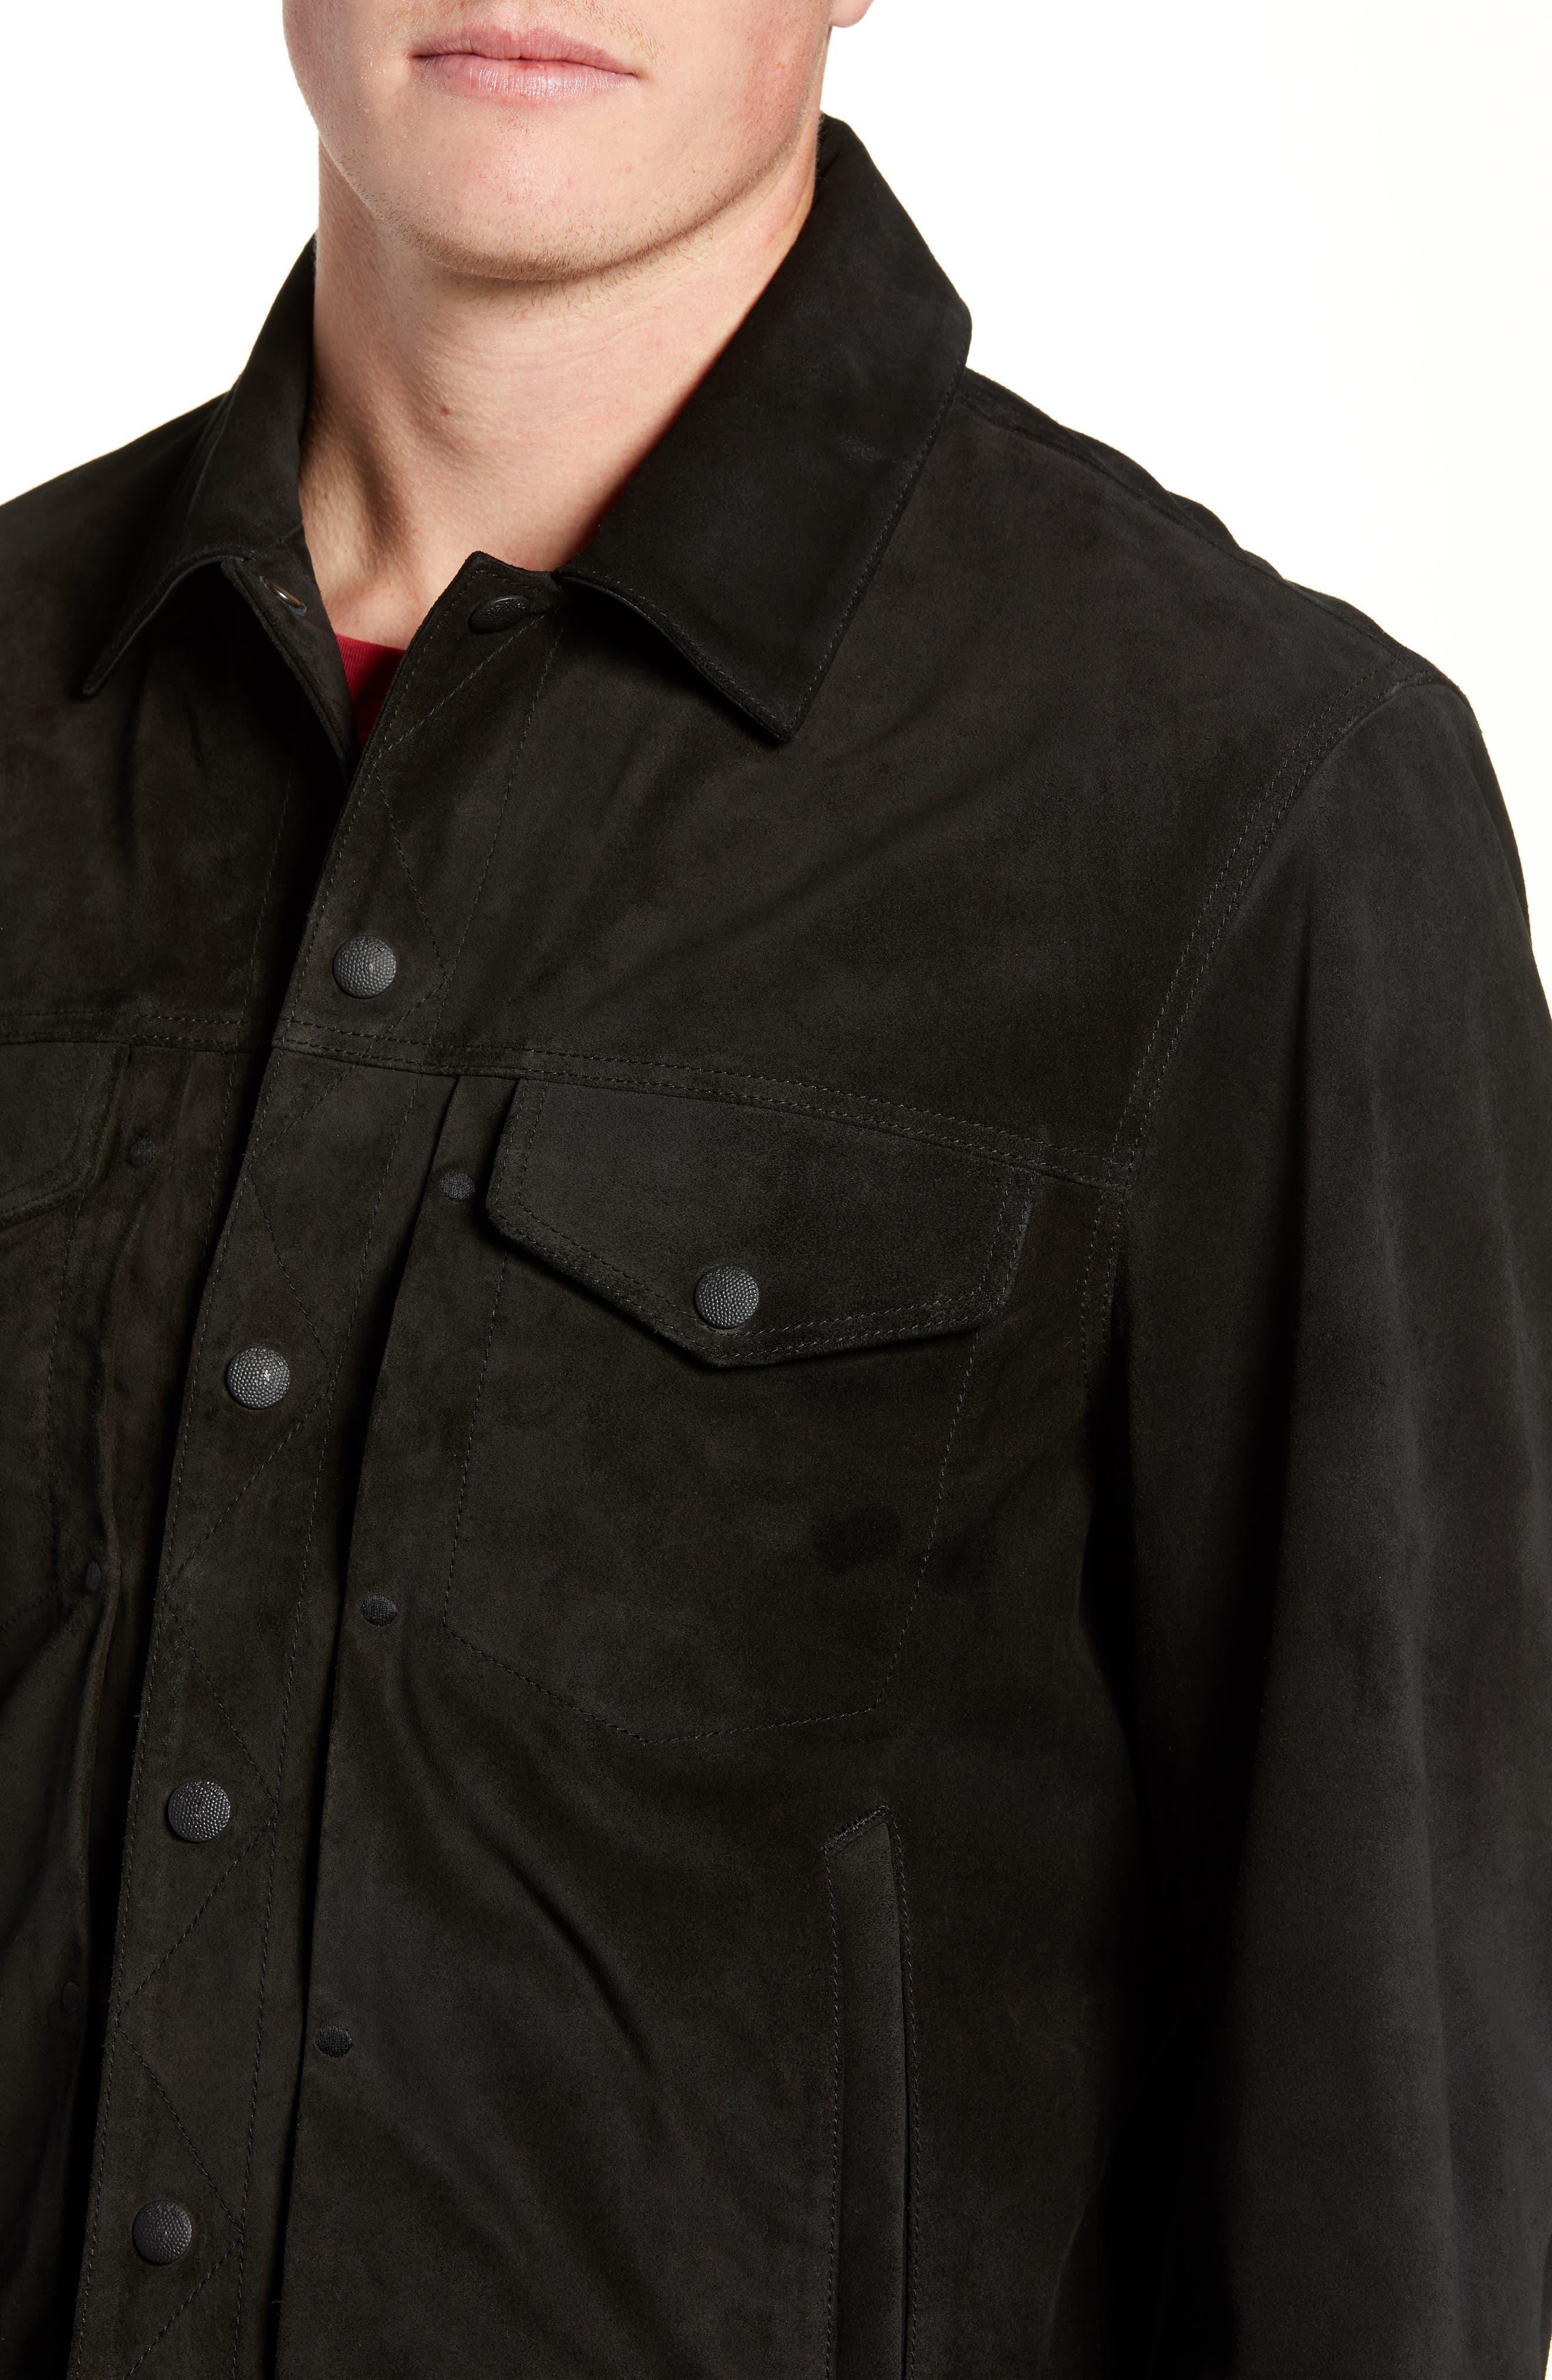 Suede Slim Fit Trucker Jacket,                             Alternate thumbnail 4, color,                             BLACK